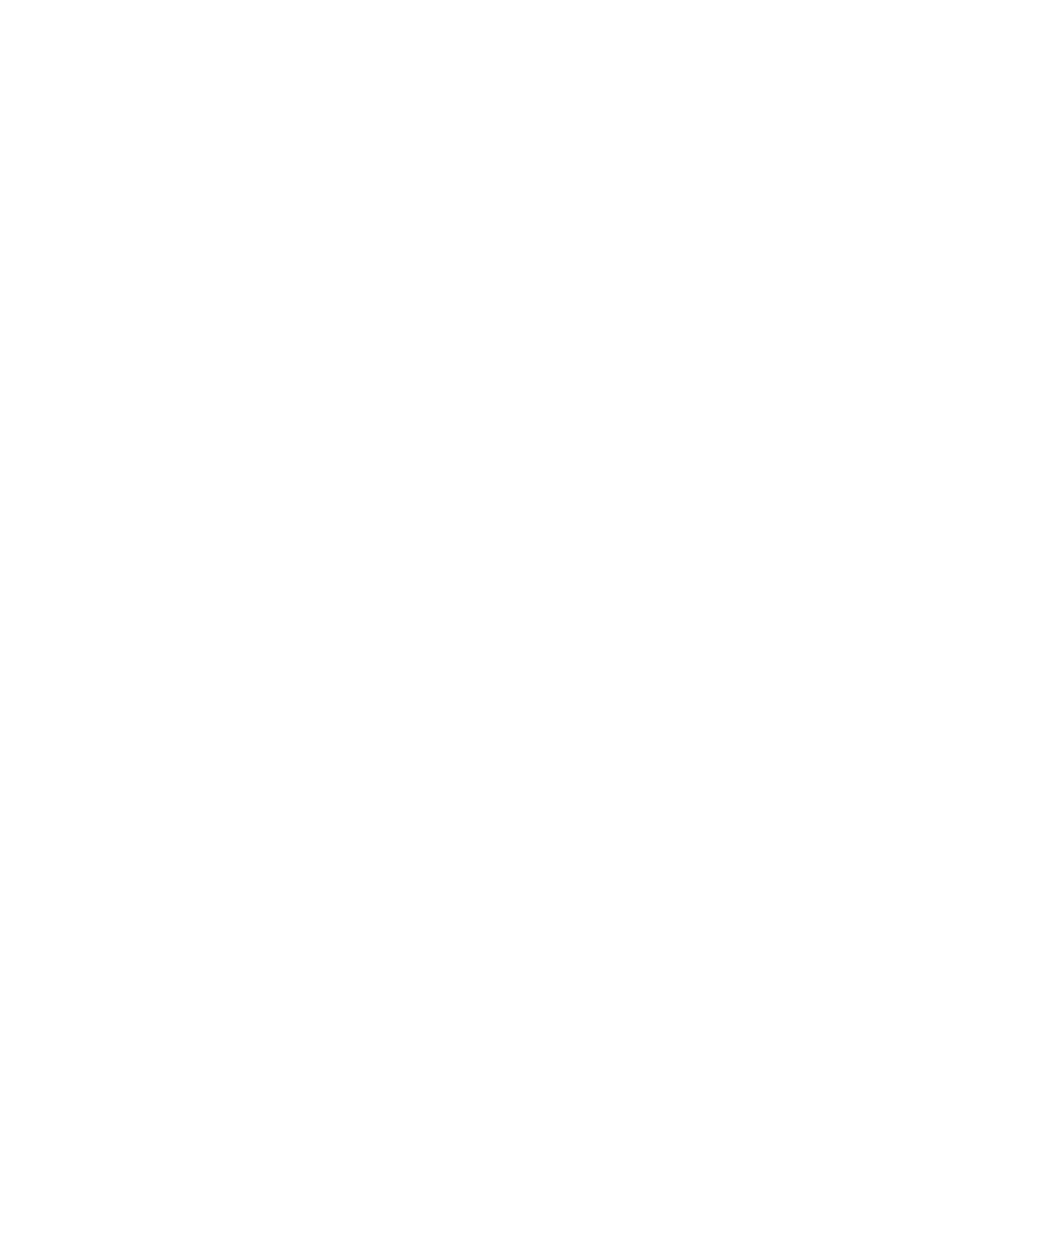 ADPM Drones